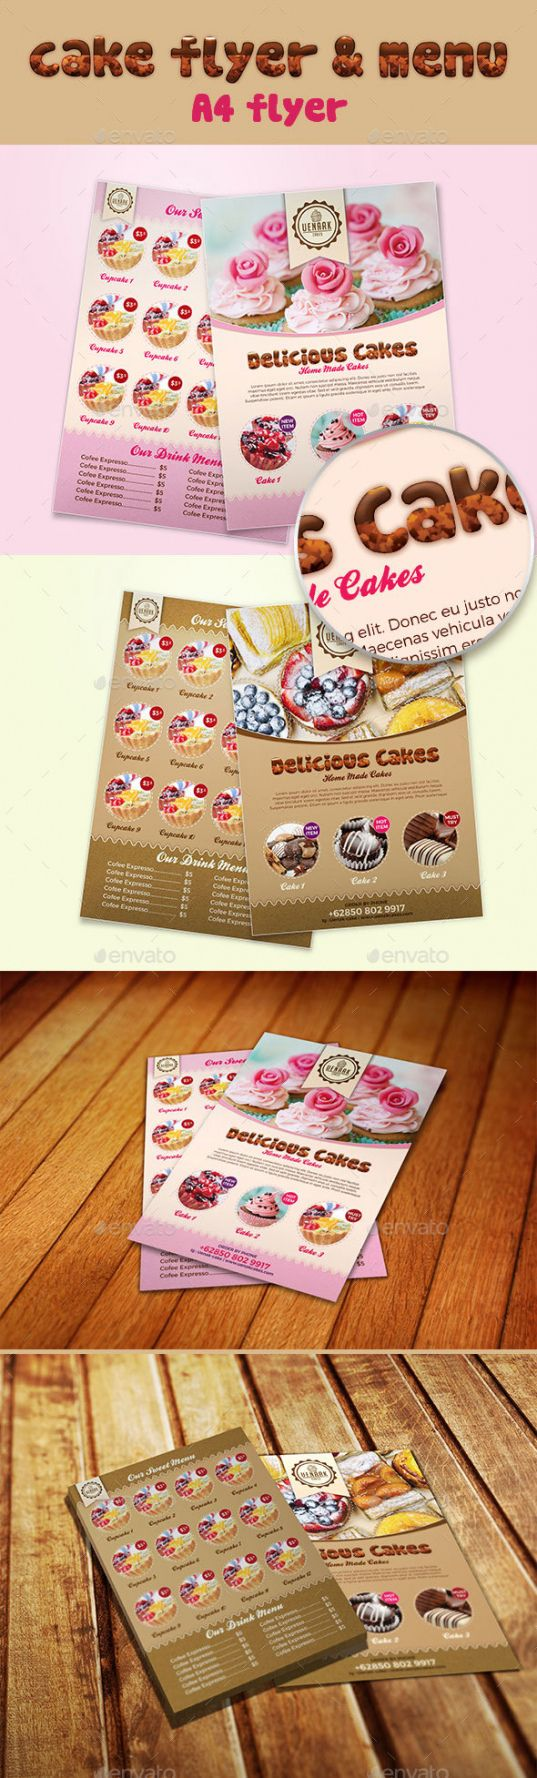 sample cake cafe menu templates from graphicriver cupcake menu template